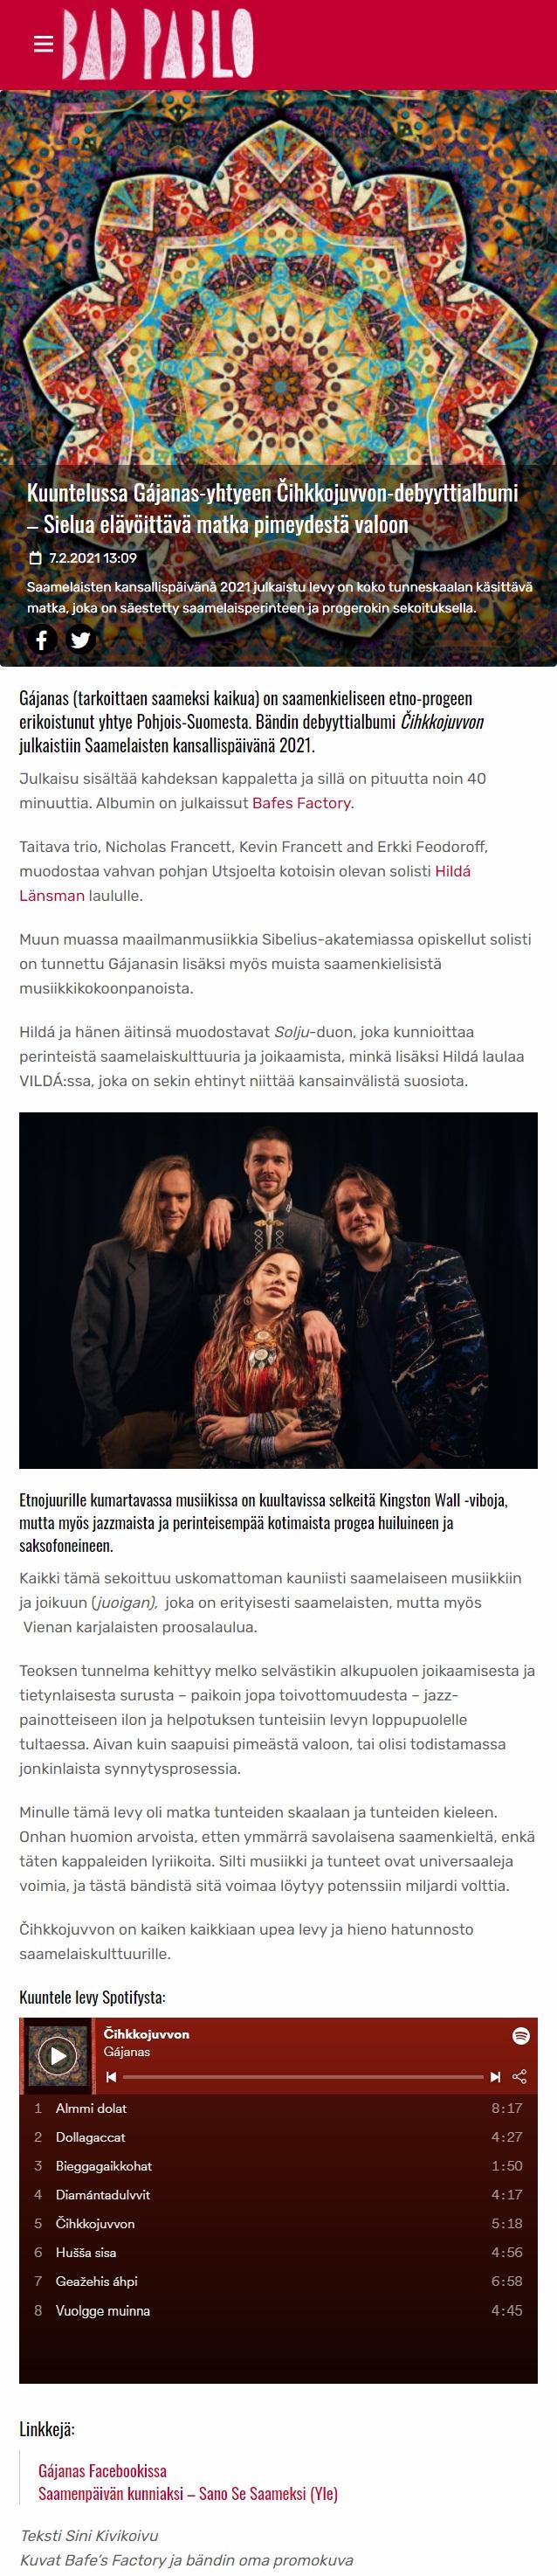 Bad Pablo (Finland), 7.2.2021